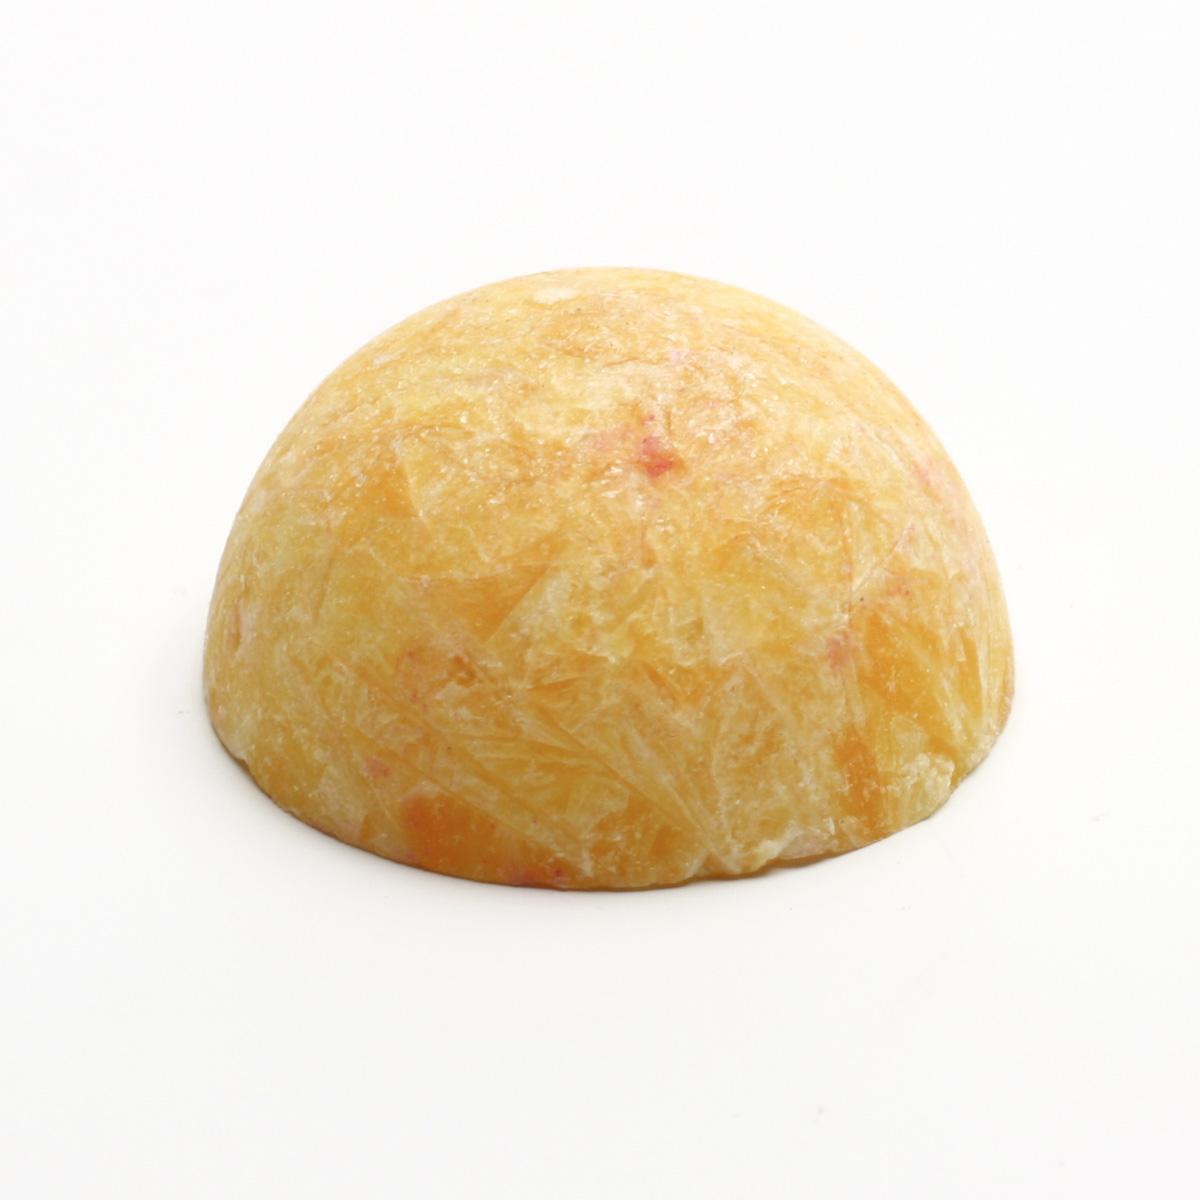 obrázek Vůně do aromalampy Kerzenfarm - pomeranč a vanilka bio-7145